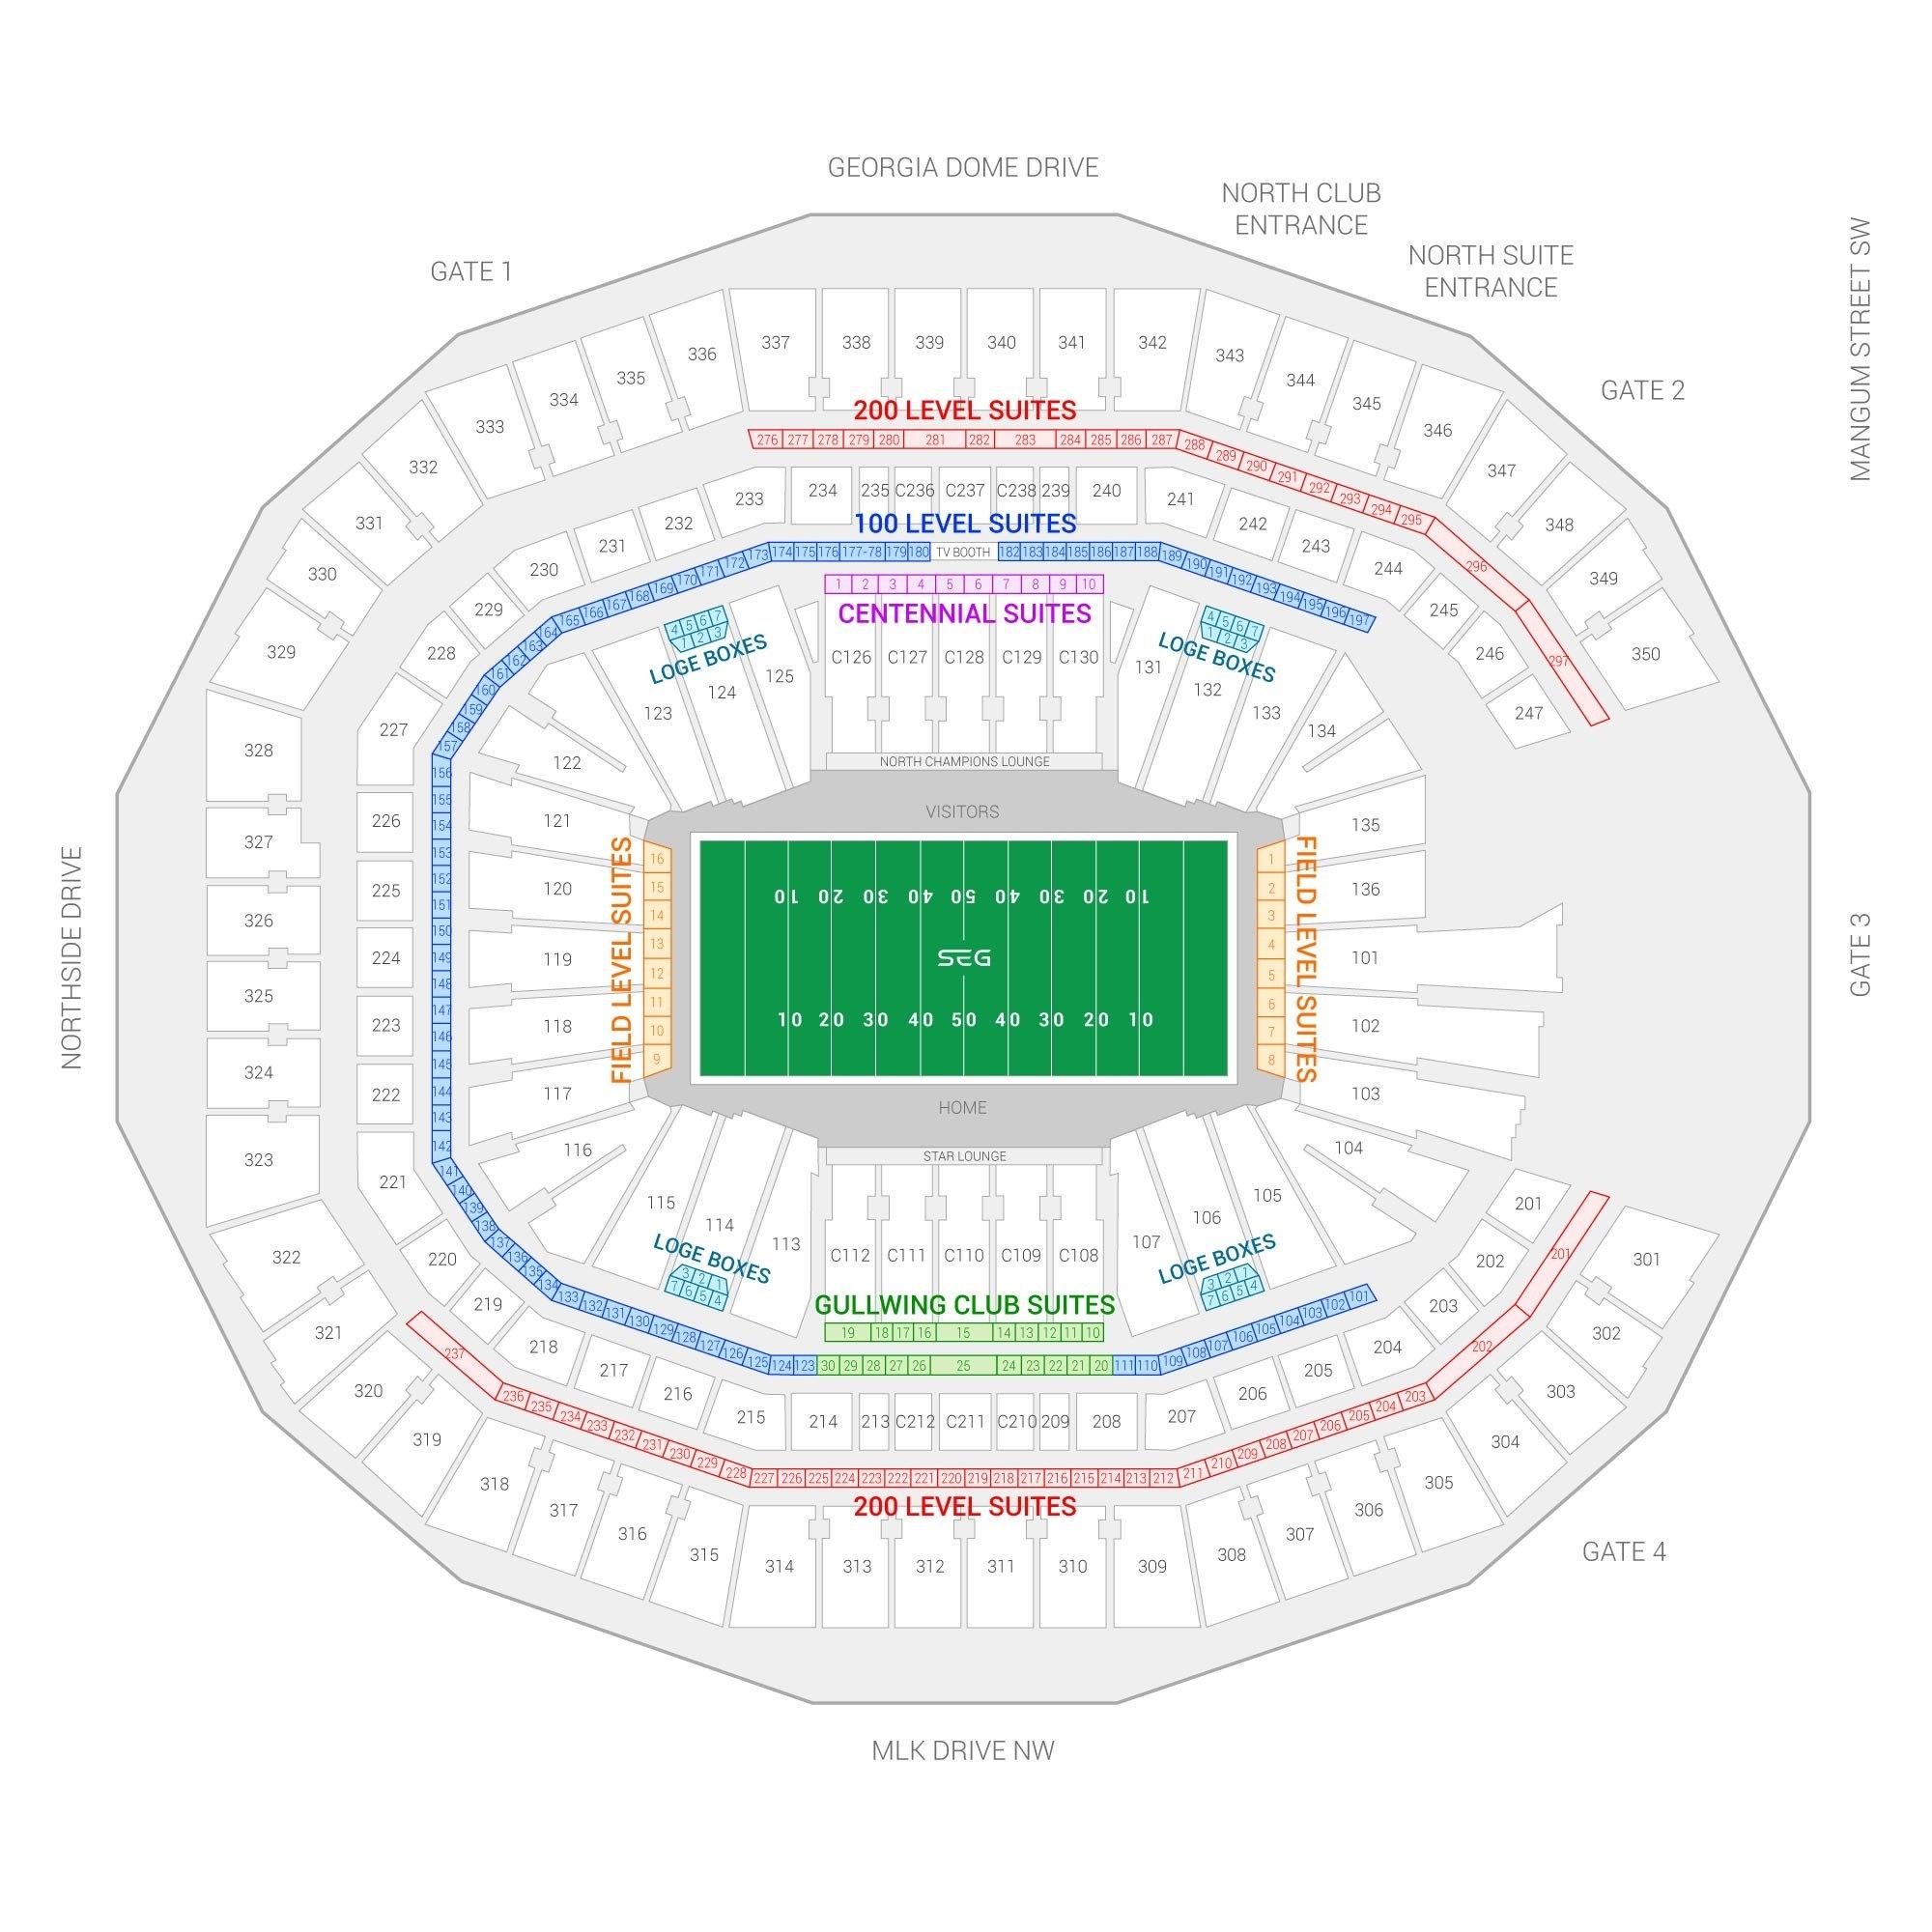 Super Bowl Liii Suite Rentals   Mercedes-Benz Stadium inside Super Bowl Tickets Seating Chart